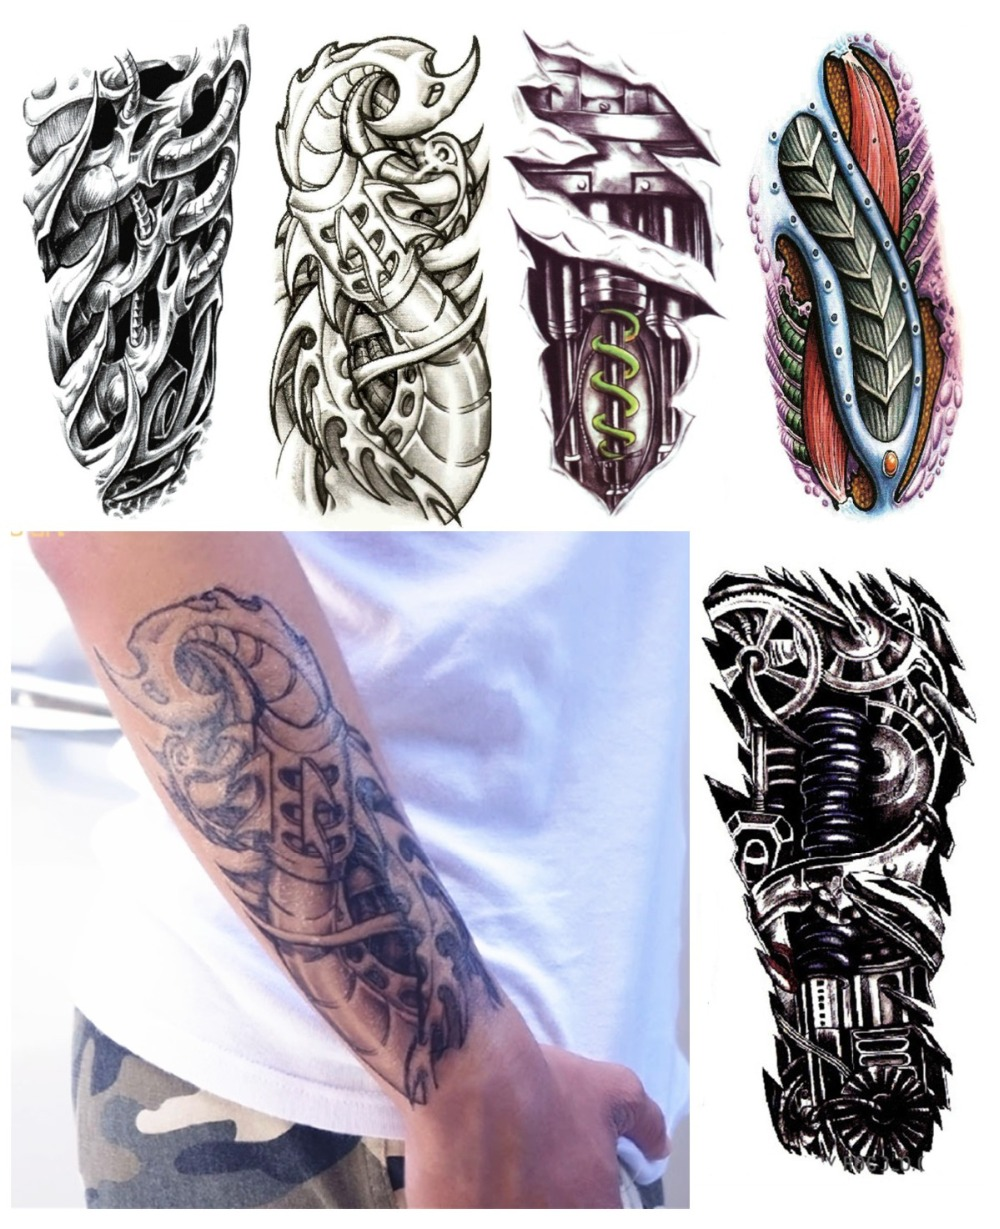 Buy 8pcs lot robot arm fake tattoos for Temporary arm tattoos